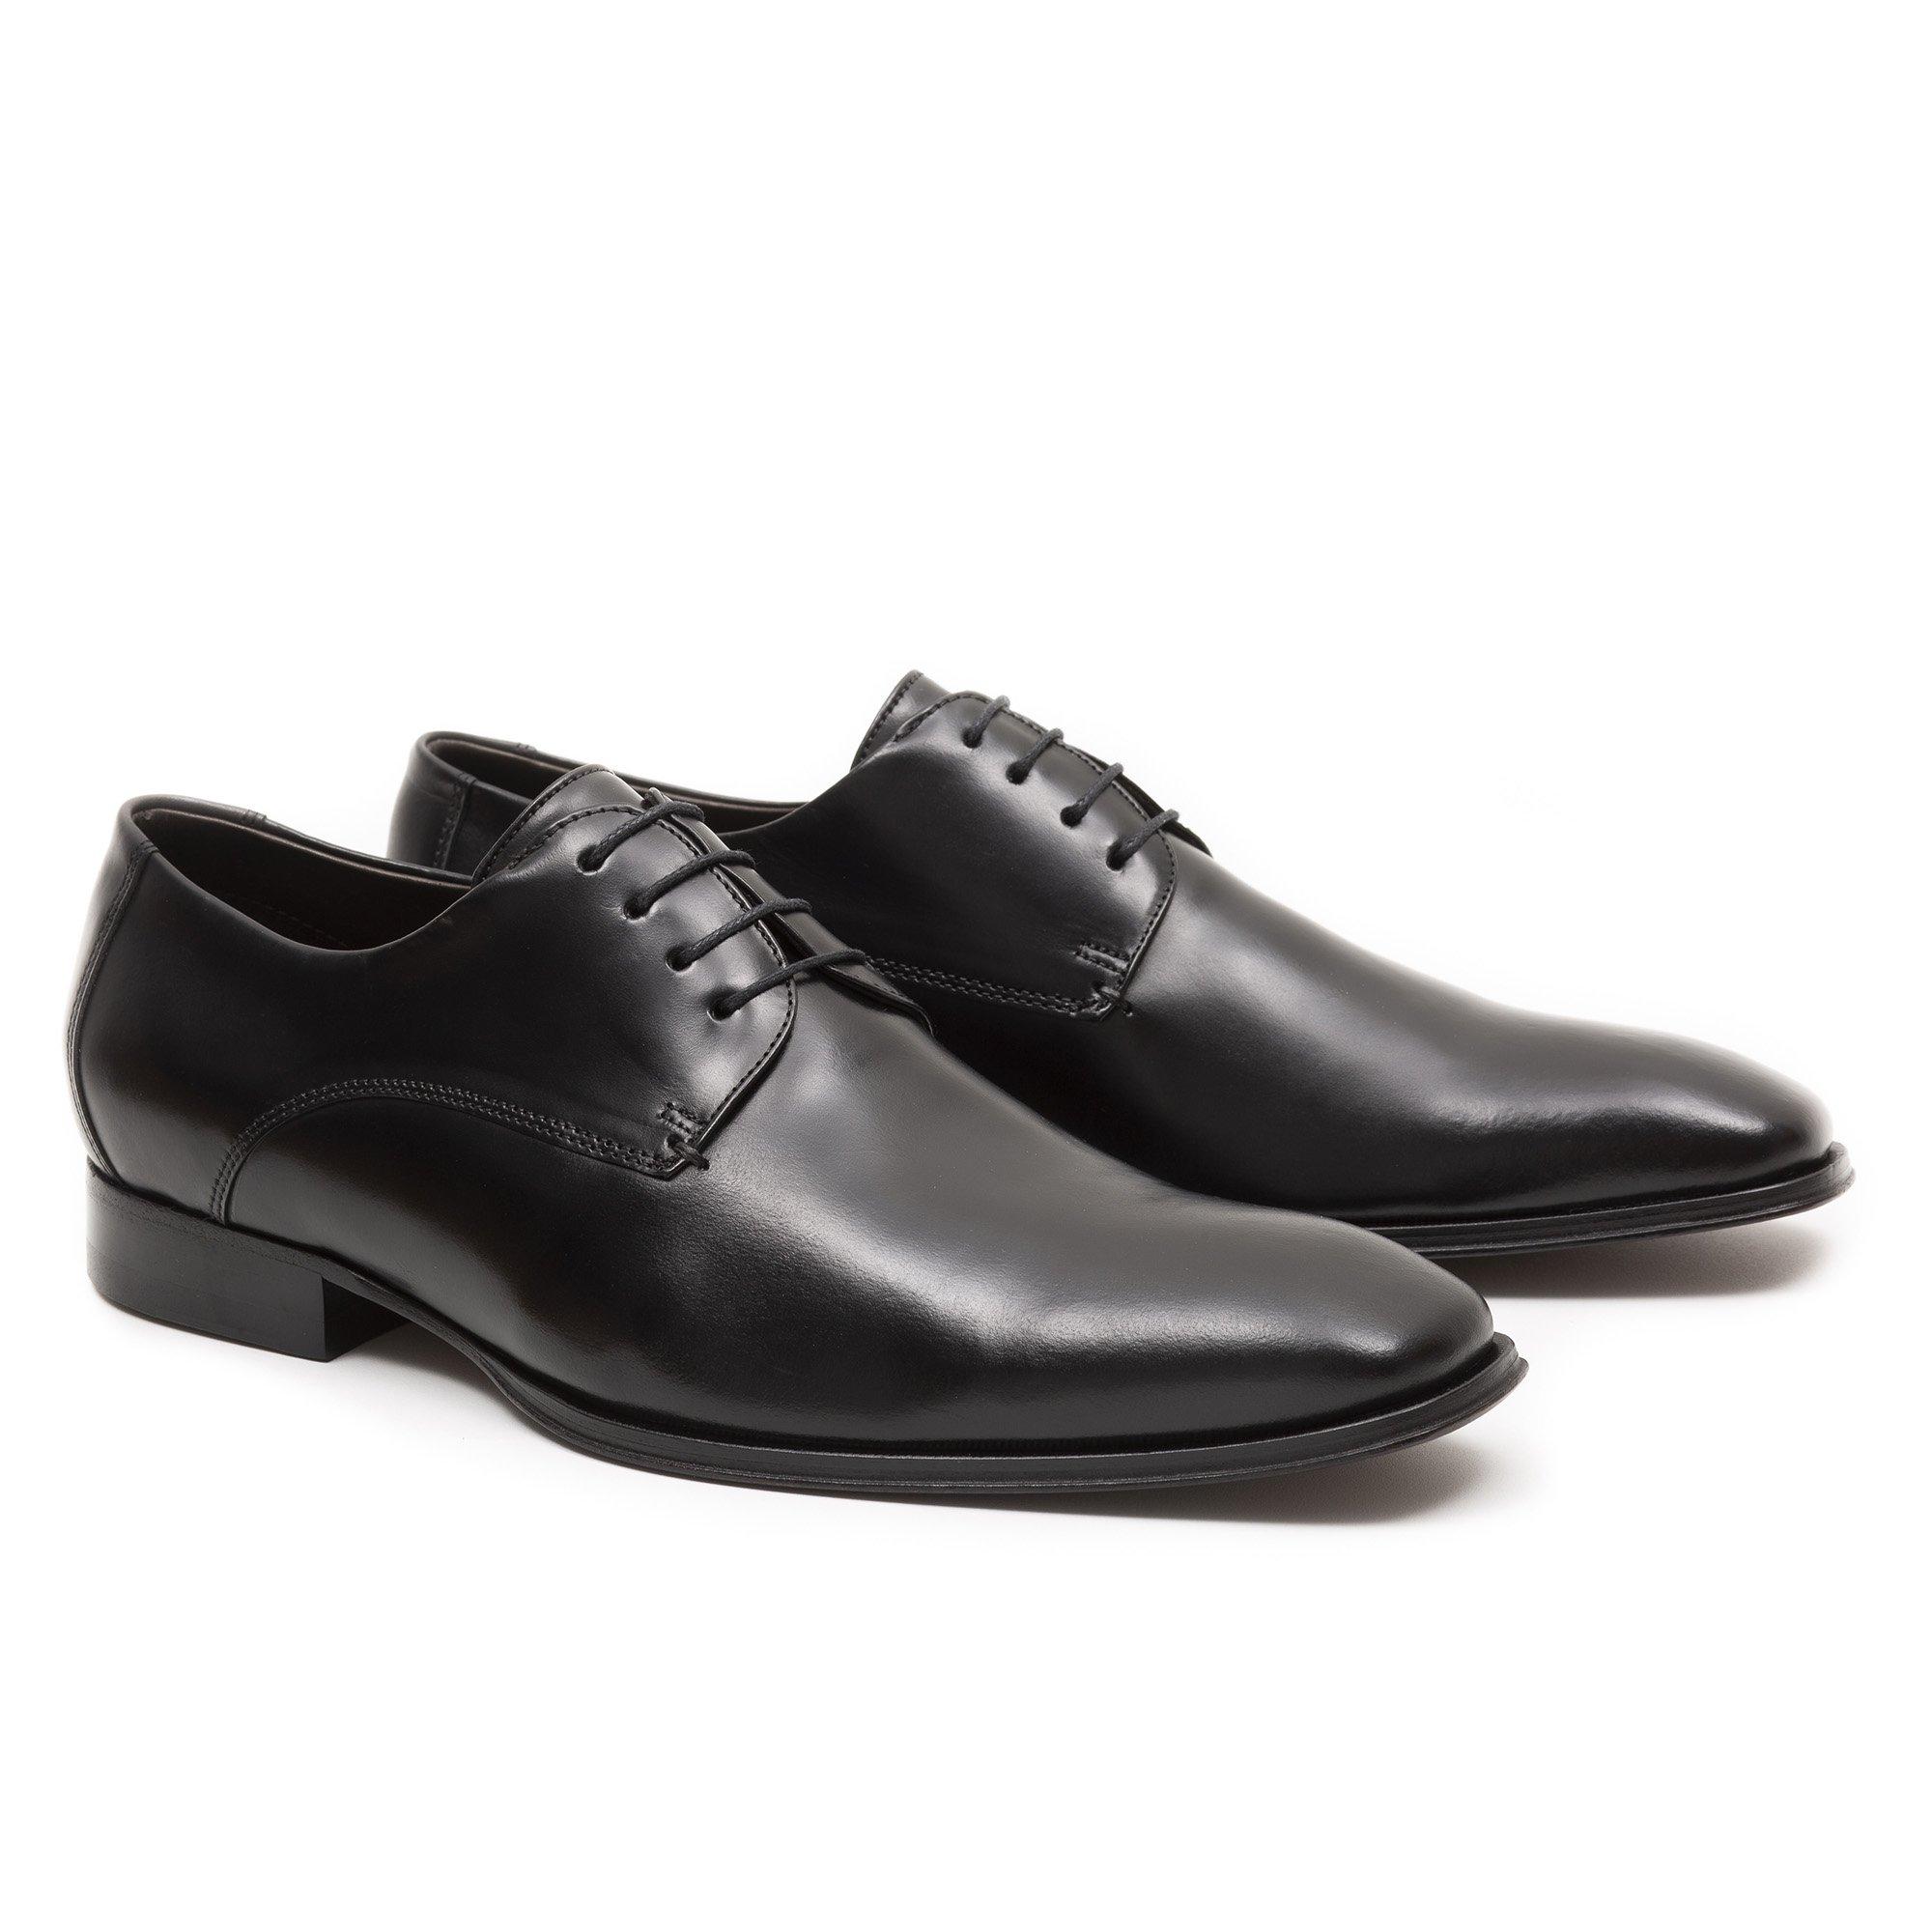 Sapato Social Masculino Derby Preto Couro Legítimo Monbran Dressy 05756P